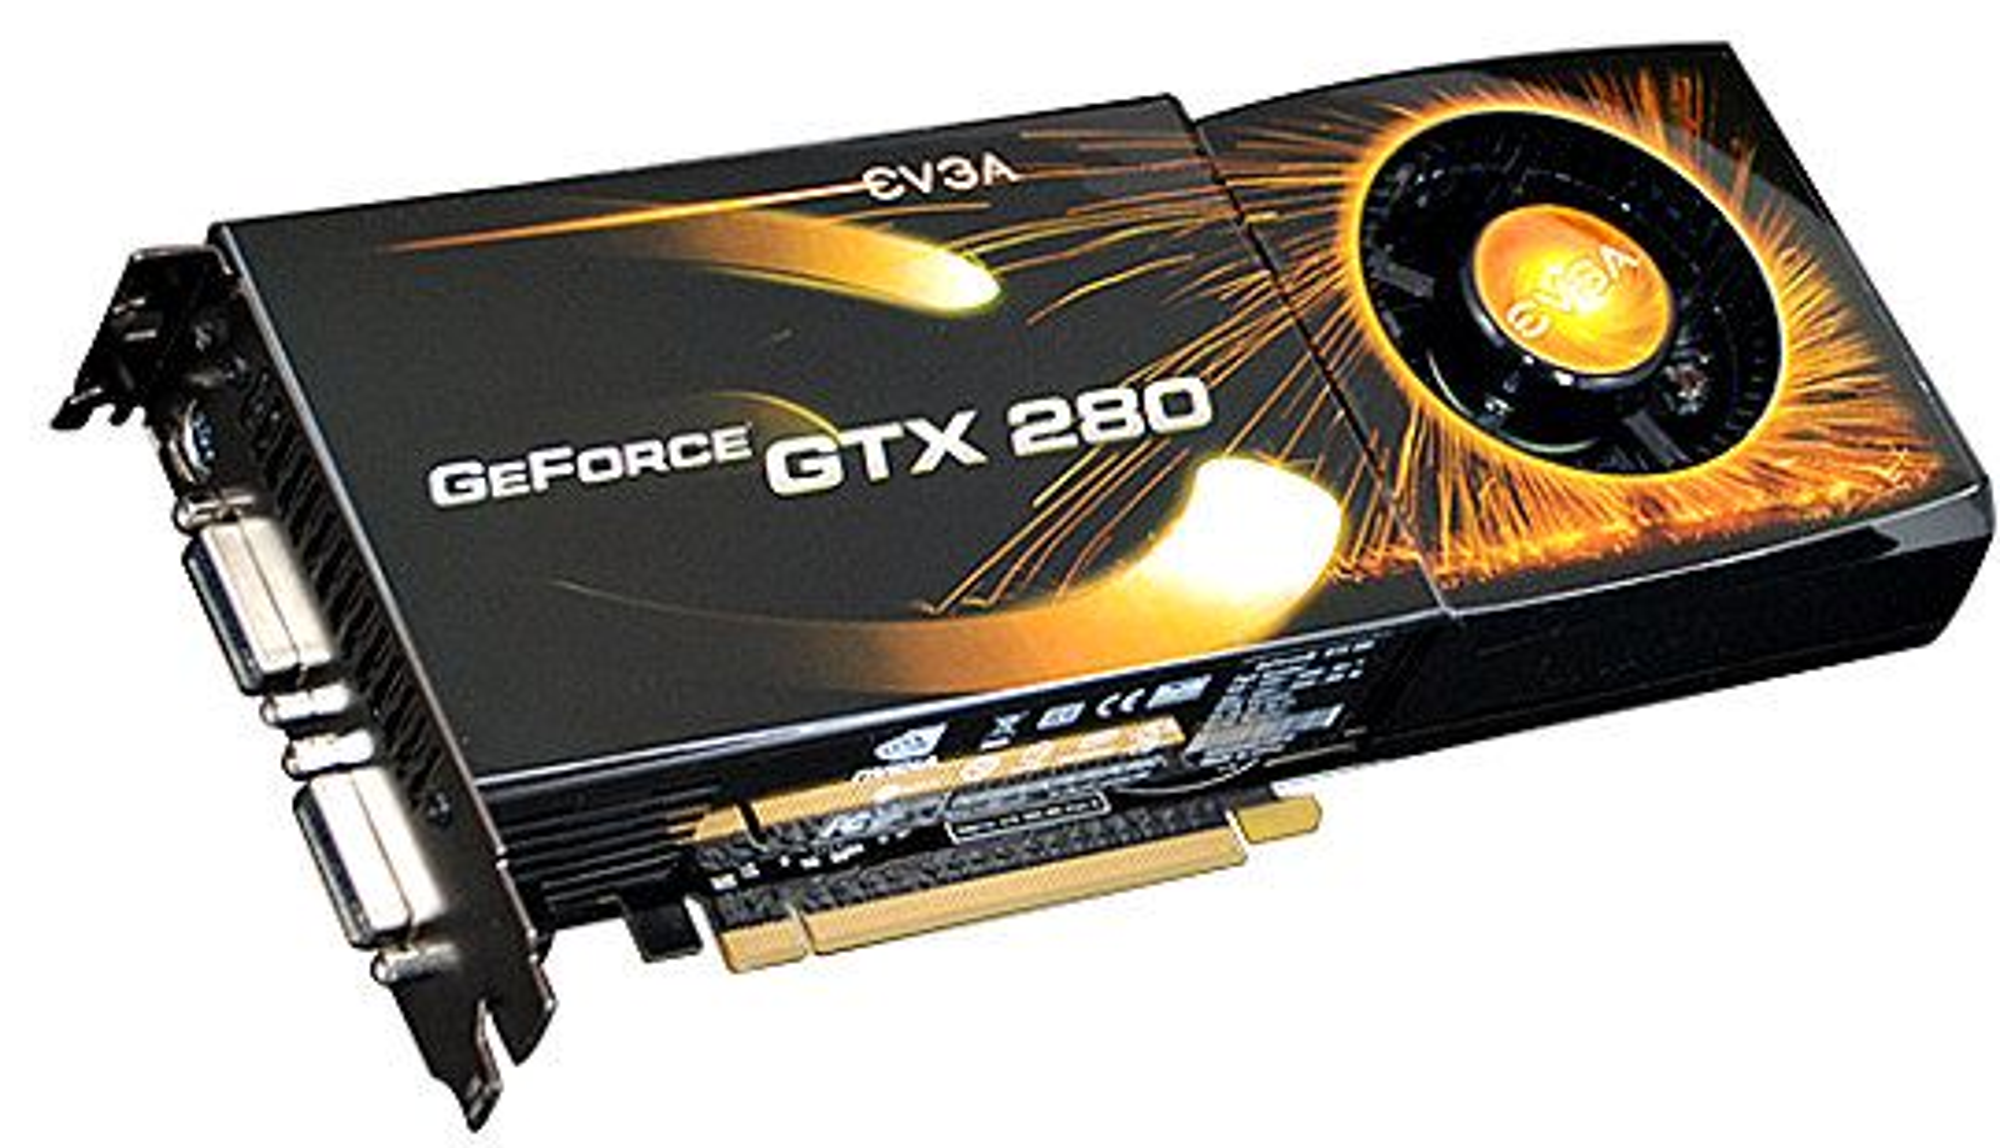 Geforce GTX 280 fra EVGA